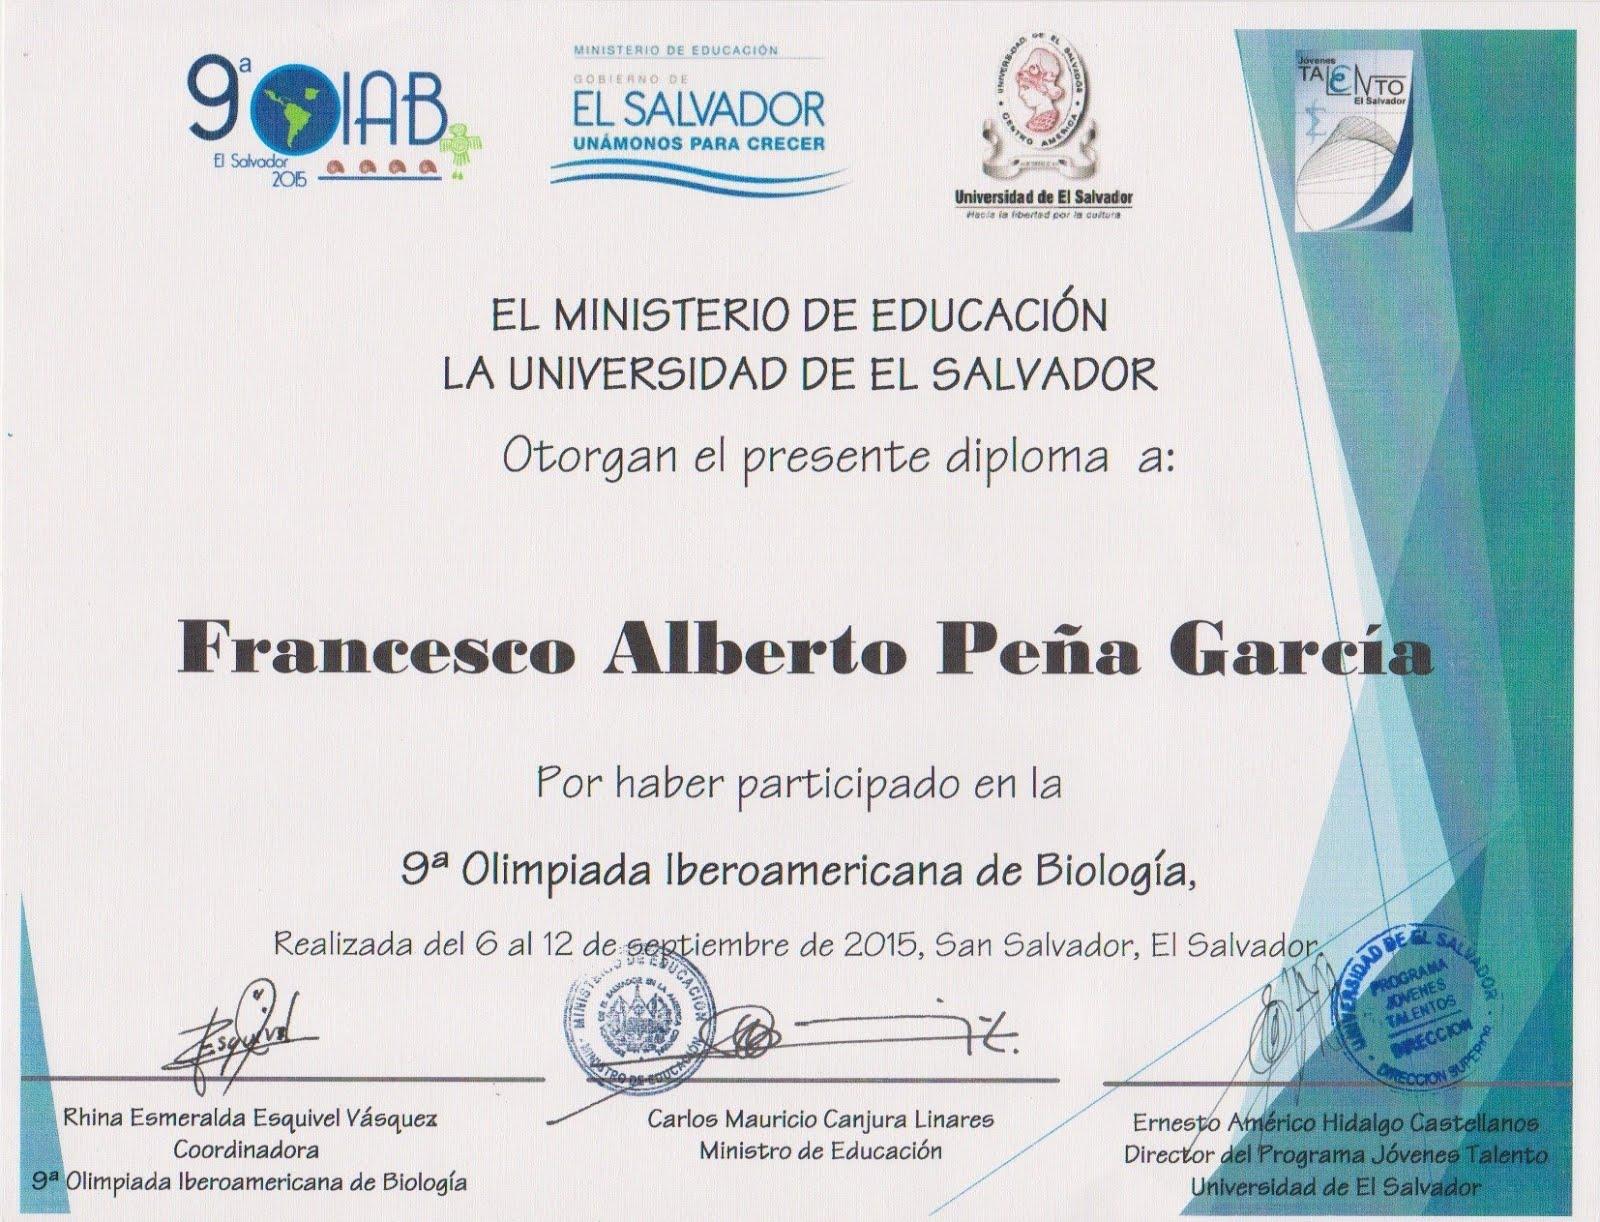 IX OLIMPIADA IBEROAMERICANA DE BIOLOGÍA OIAB EL SALVADOR 2015.